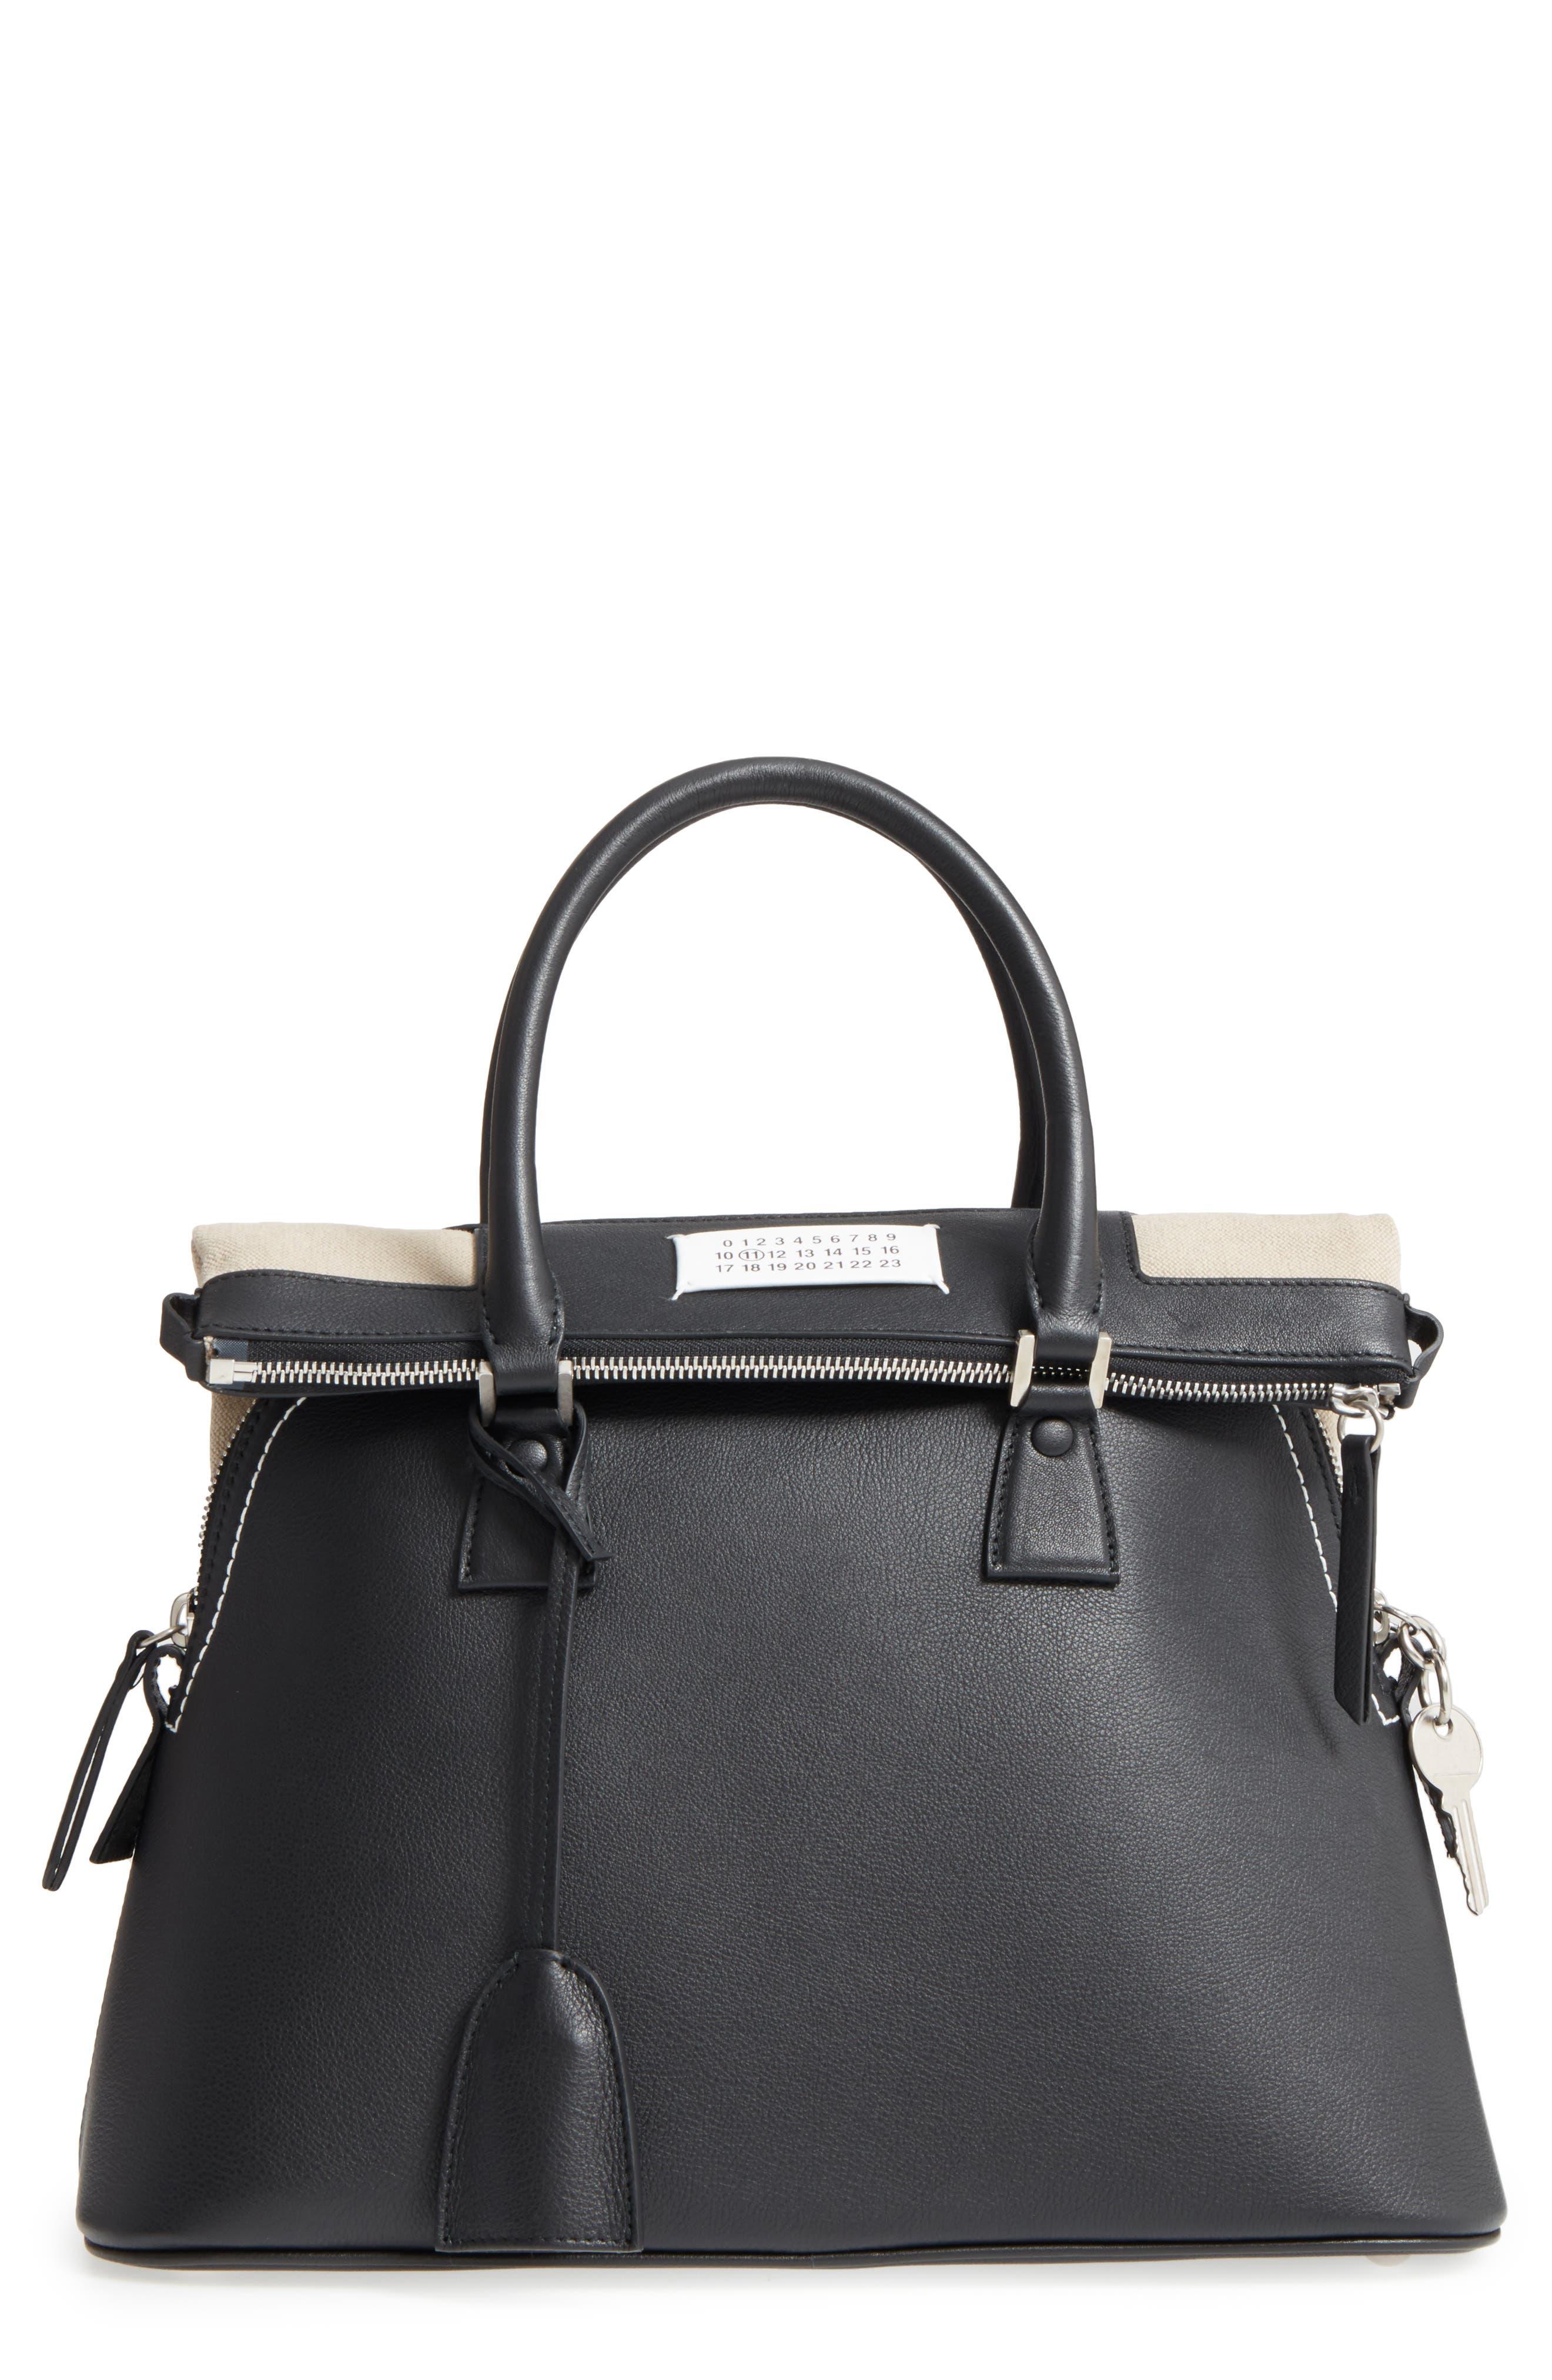 Medium 5AC Leather Handbag,                         Main,                         color, Black